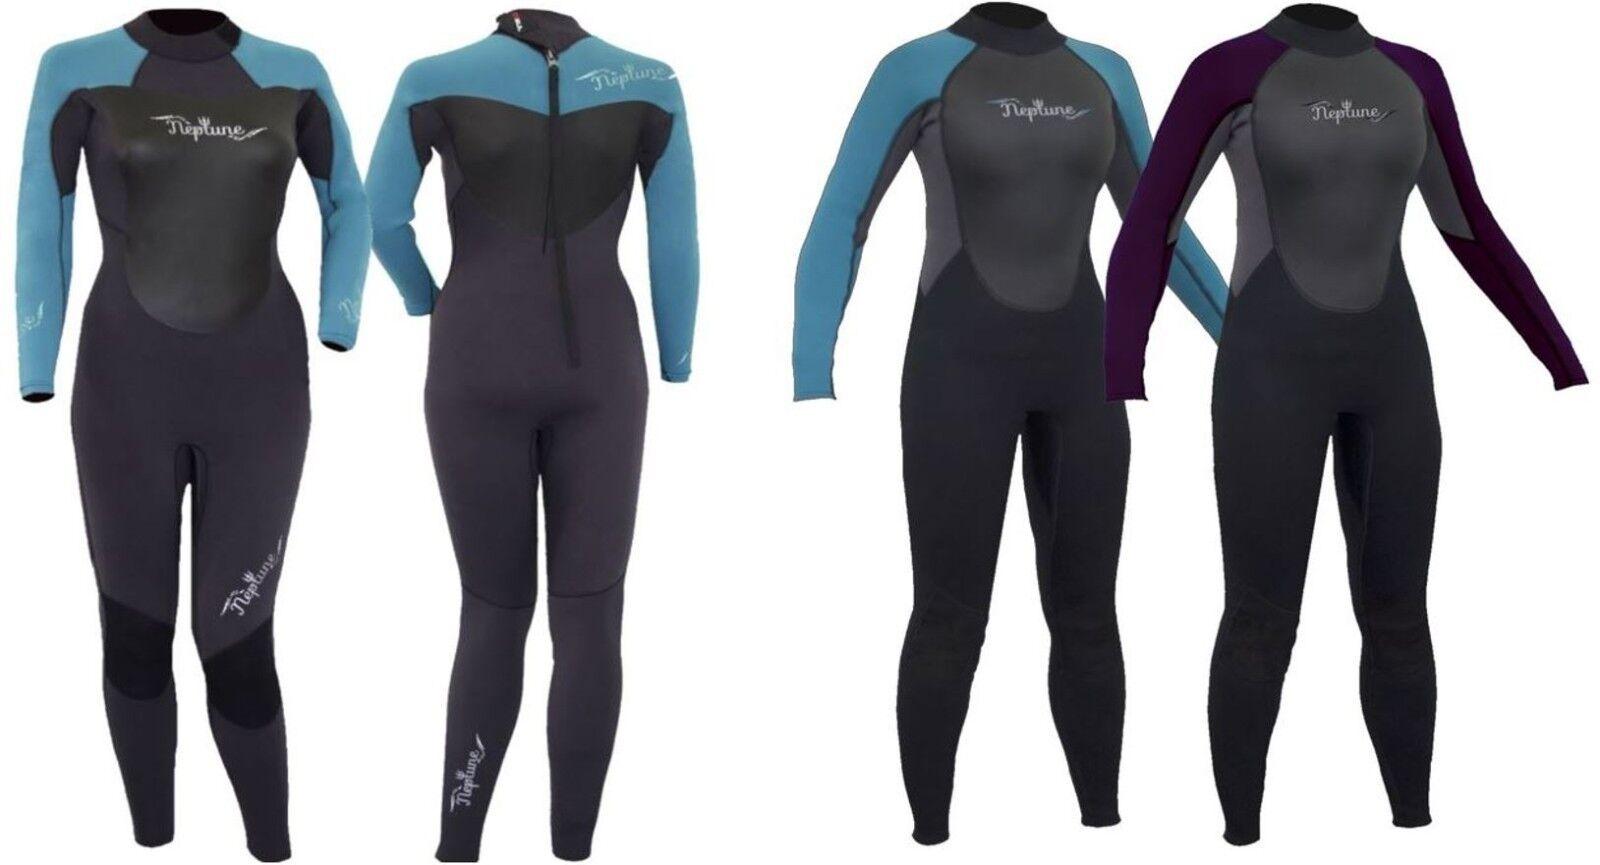 NEPTUNE 3mm or 5mm NEOPRENE LADIES FULL WETSUIT Surf Swim Kayak Sail SUP Jet Ski